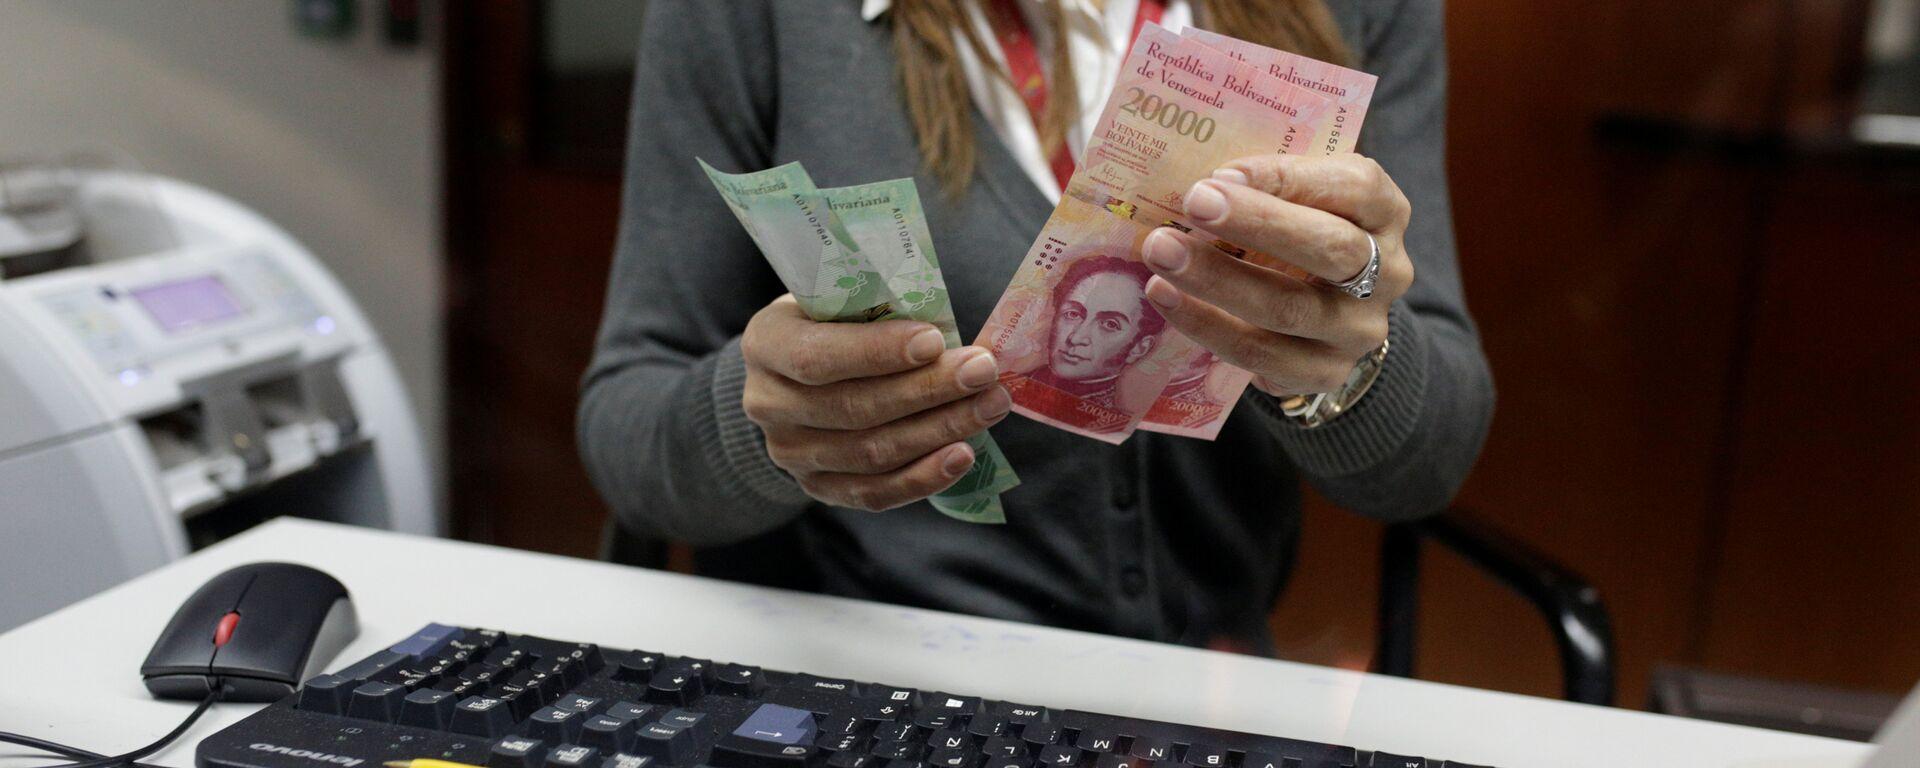 A bank teller counts bolivar banknotes at a Banco de Venezuela branch in Caracas - Sputnik Mundo, 1920, 21.01.2021